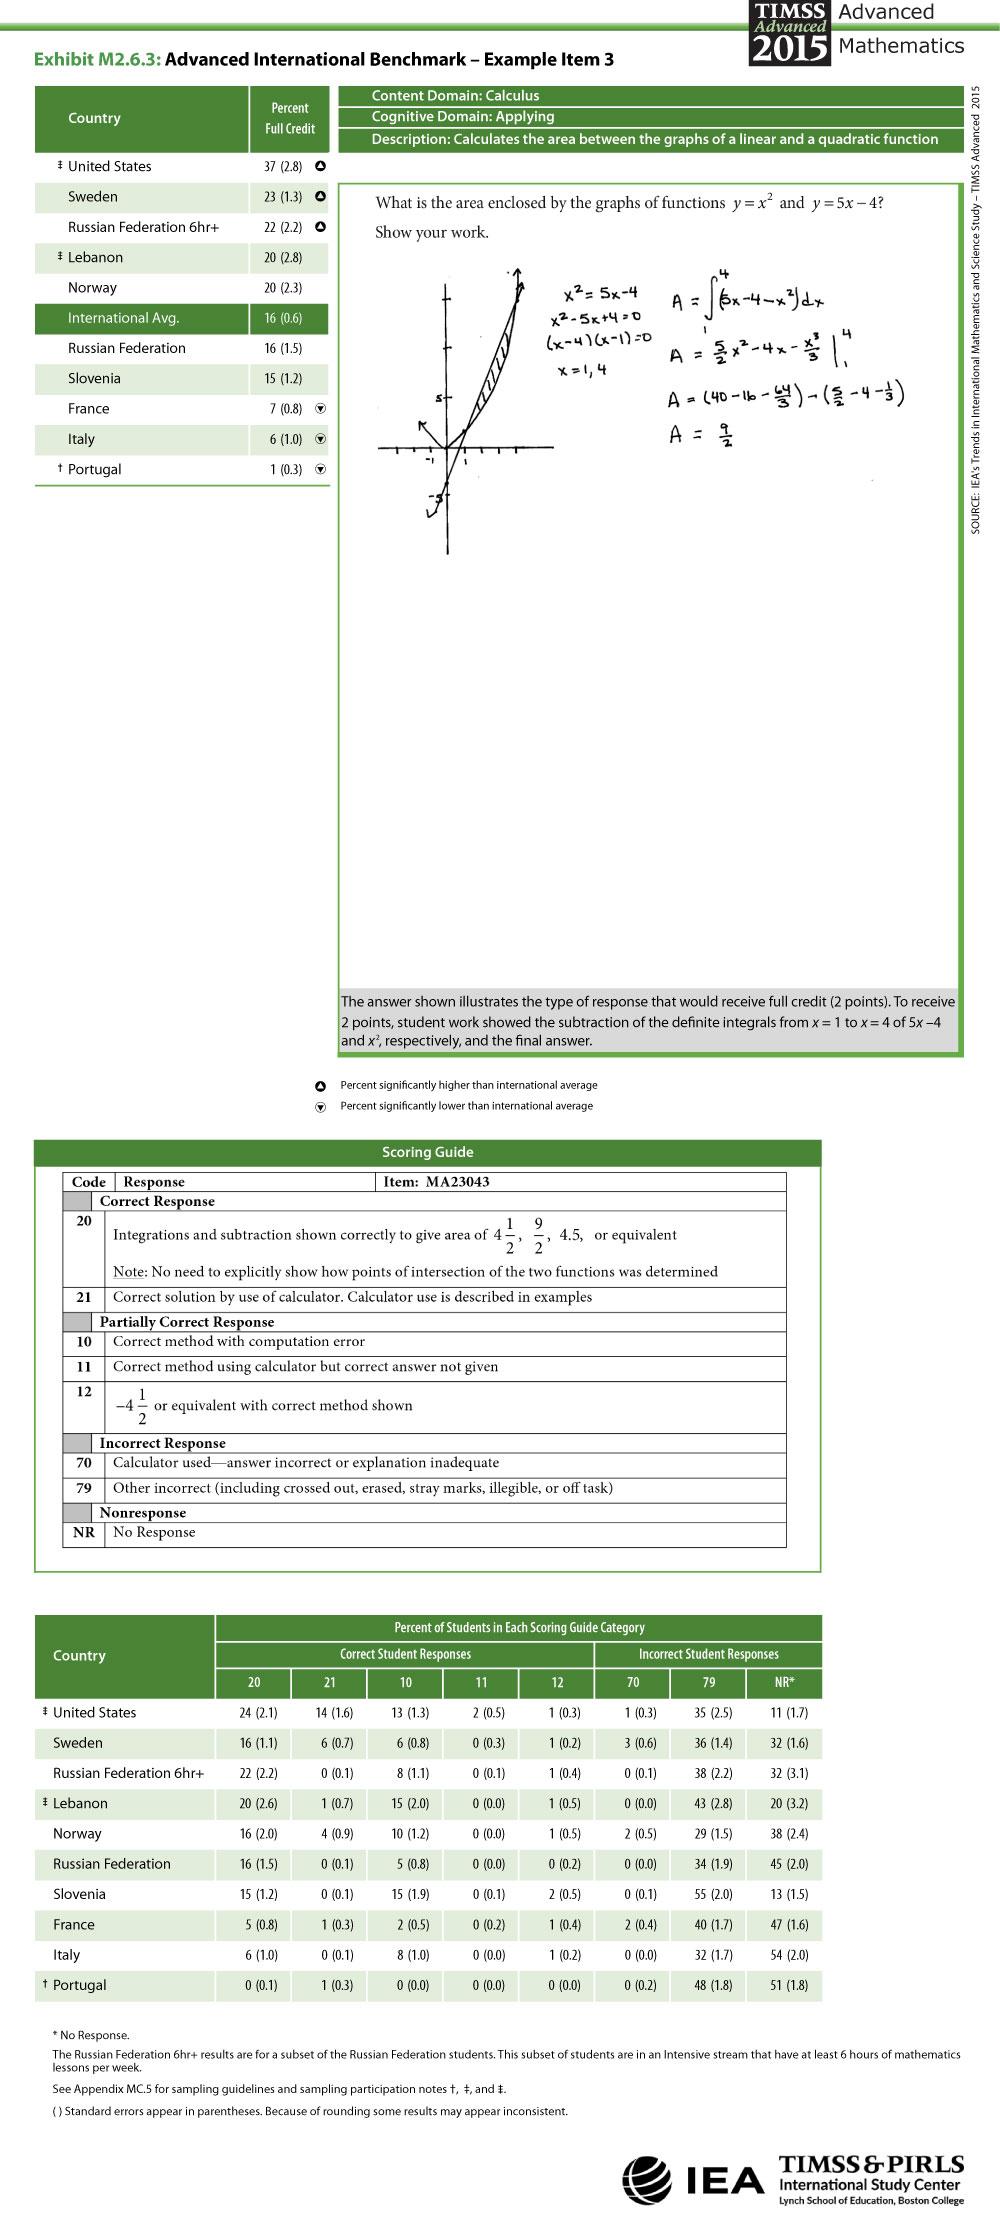 Advanced International Benchmark Item 3